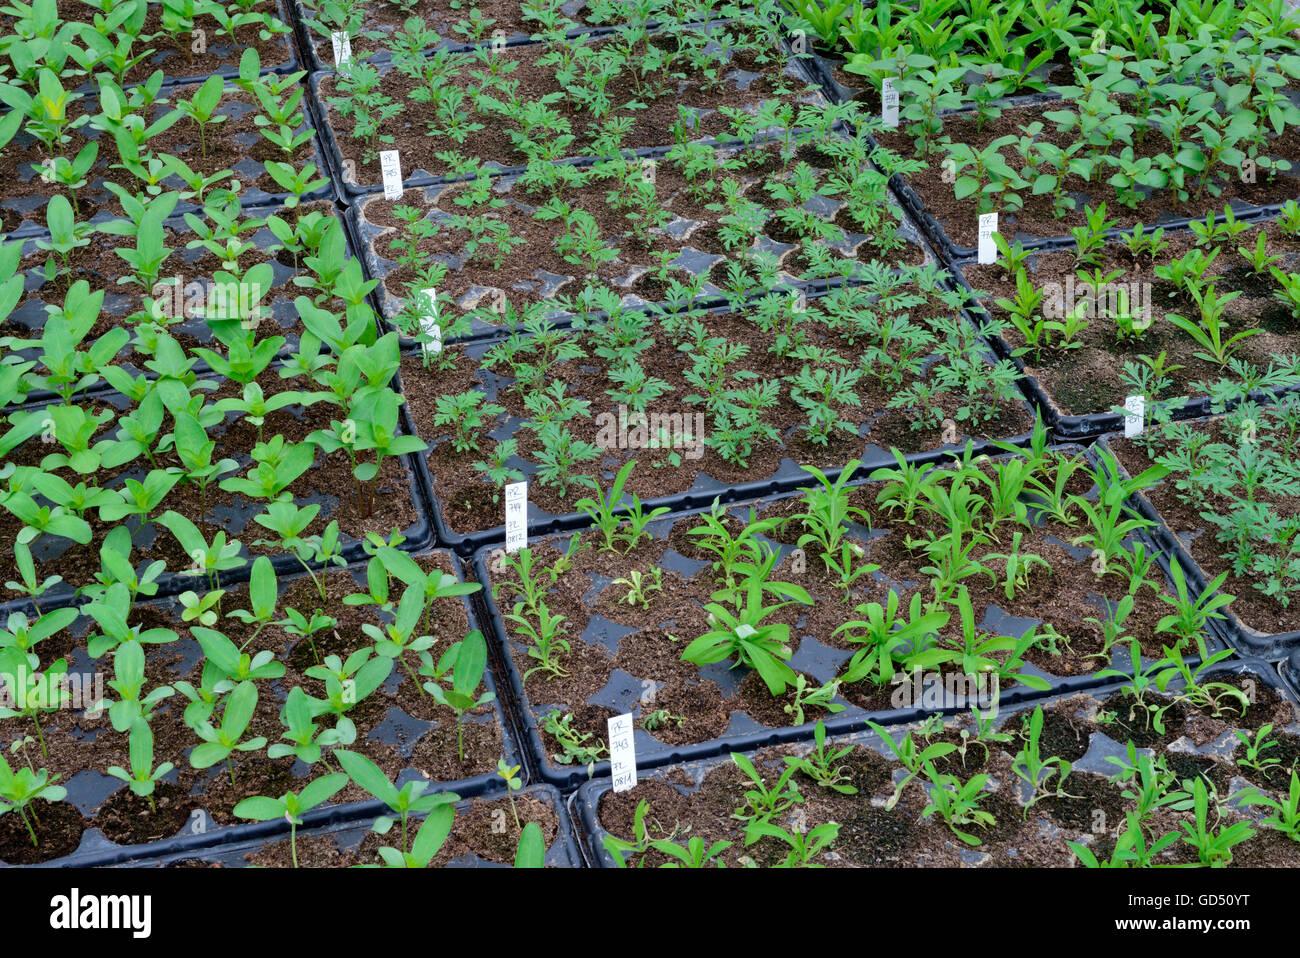 Pflanzenzucht in Gaertnerei - Stock Image